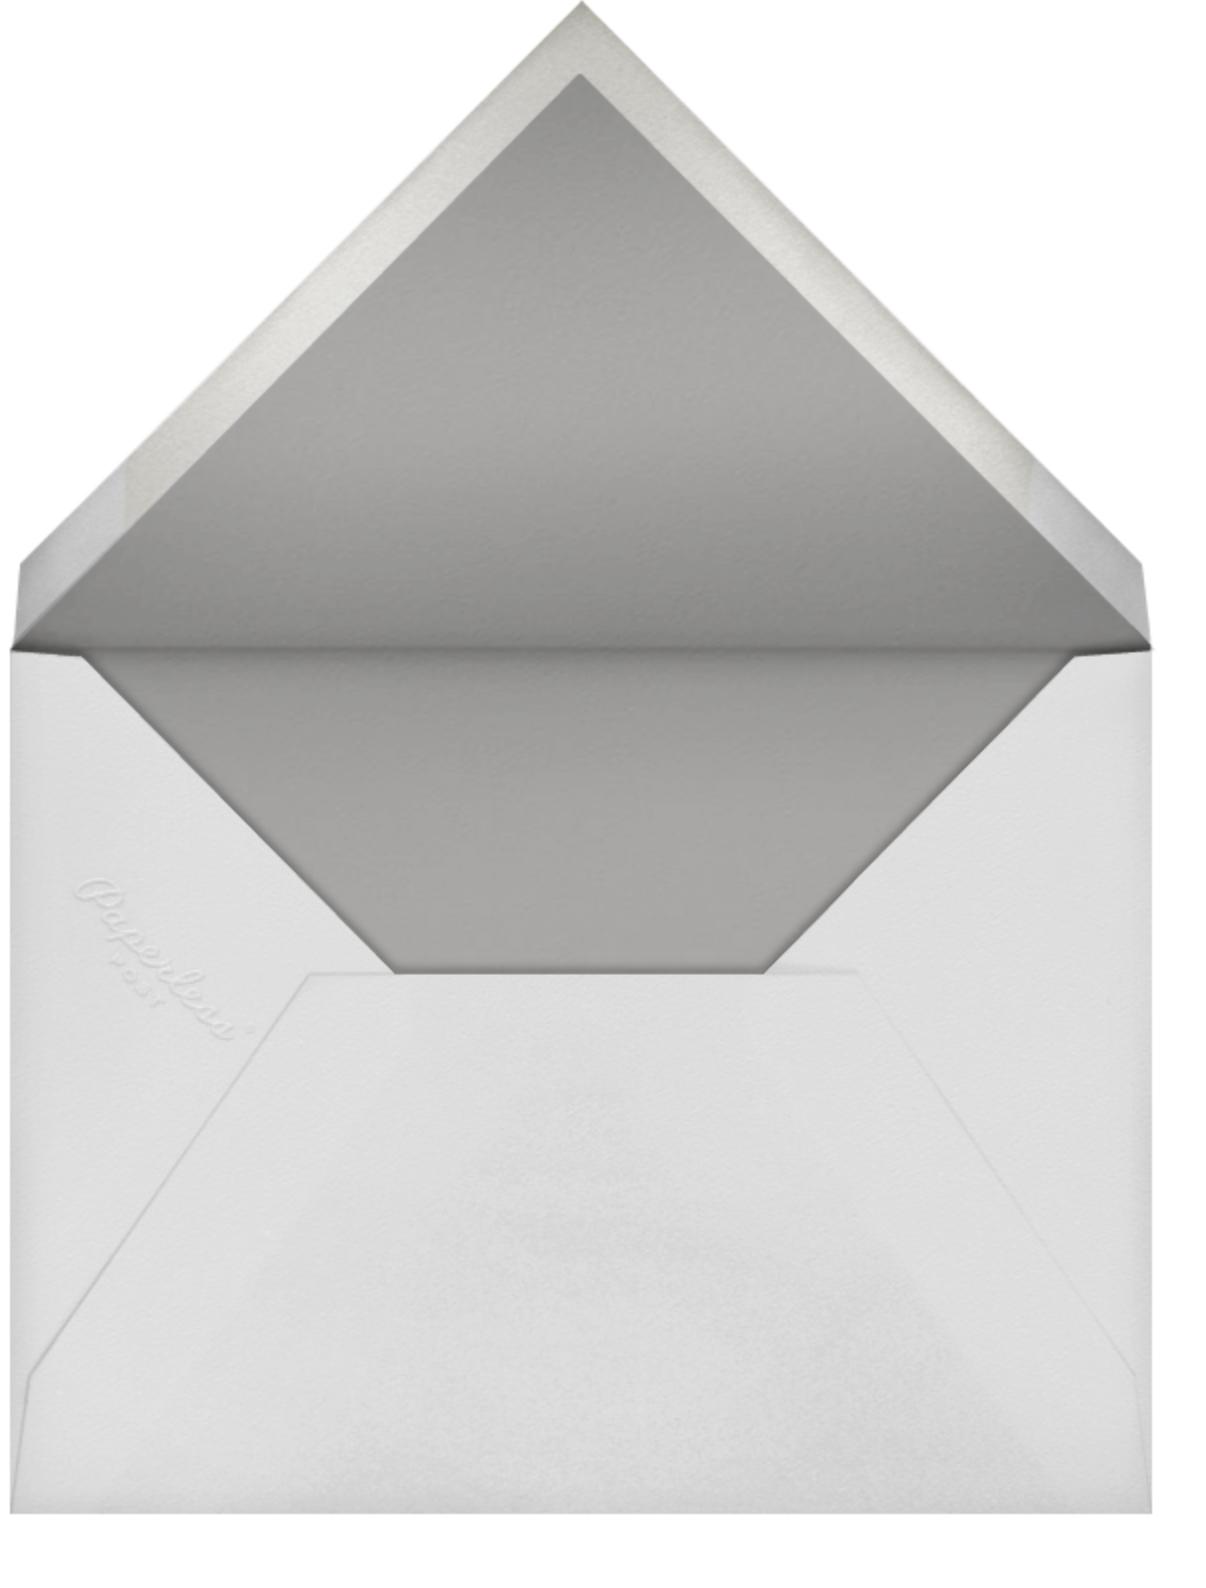 Floral Trellis II (Stationery) - Pink - Oscar de la Renta - Envelope